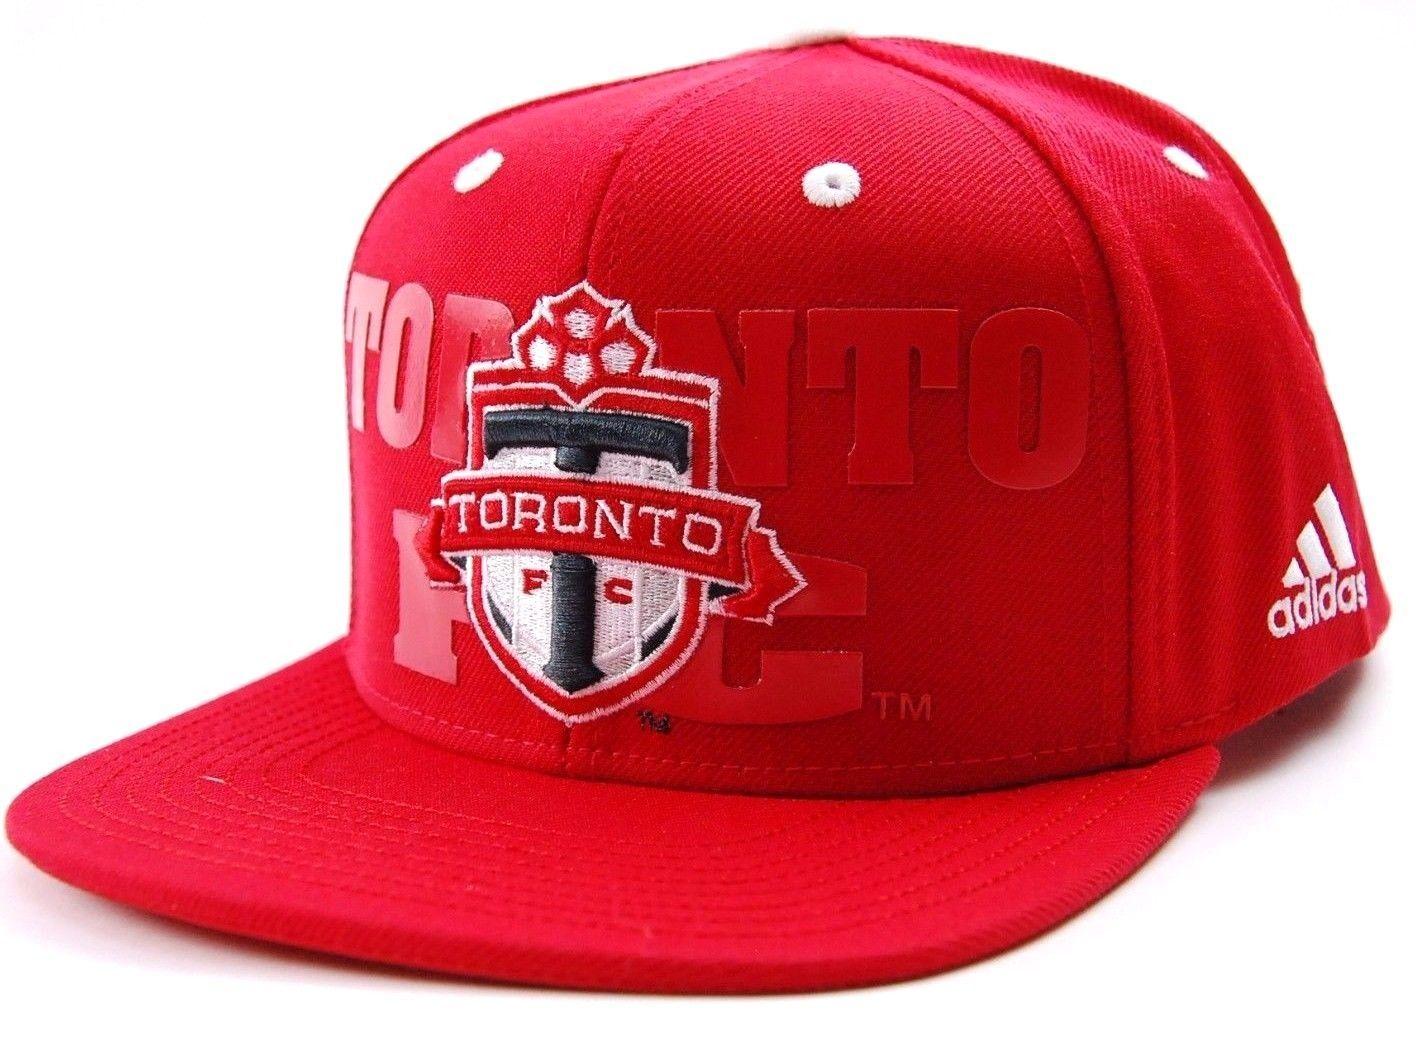 reputable site c4f3a 5b5f3 Toronto FC adidas NZP50 Academy MLS Soccer and 50 similar items